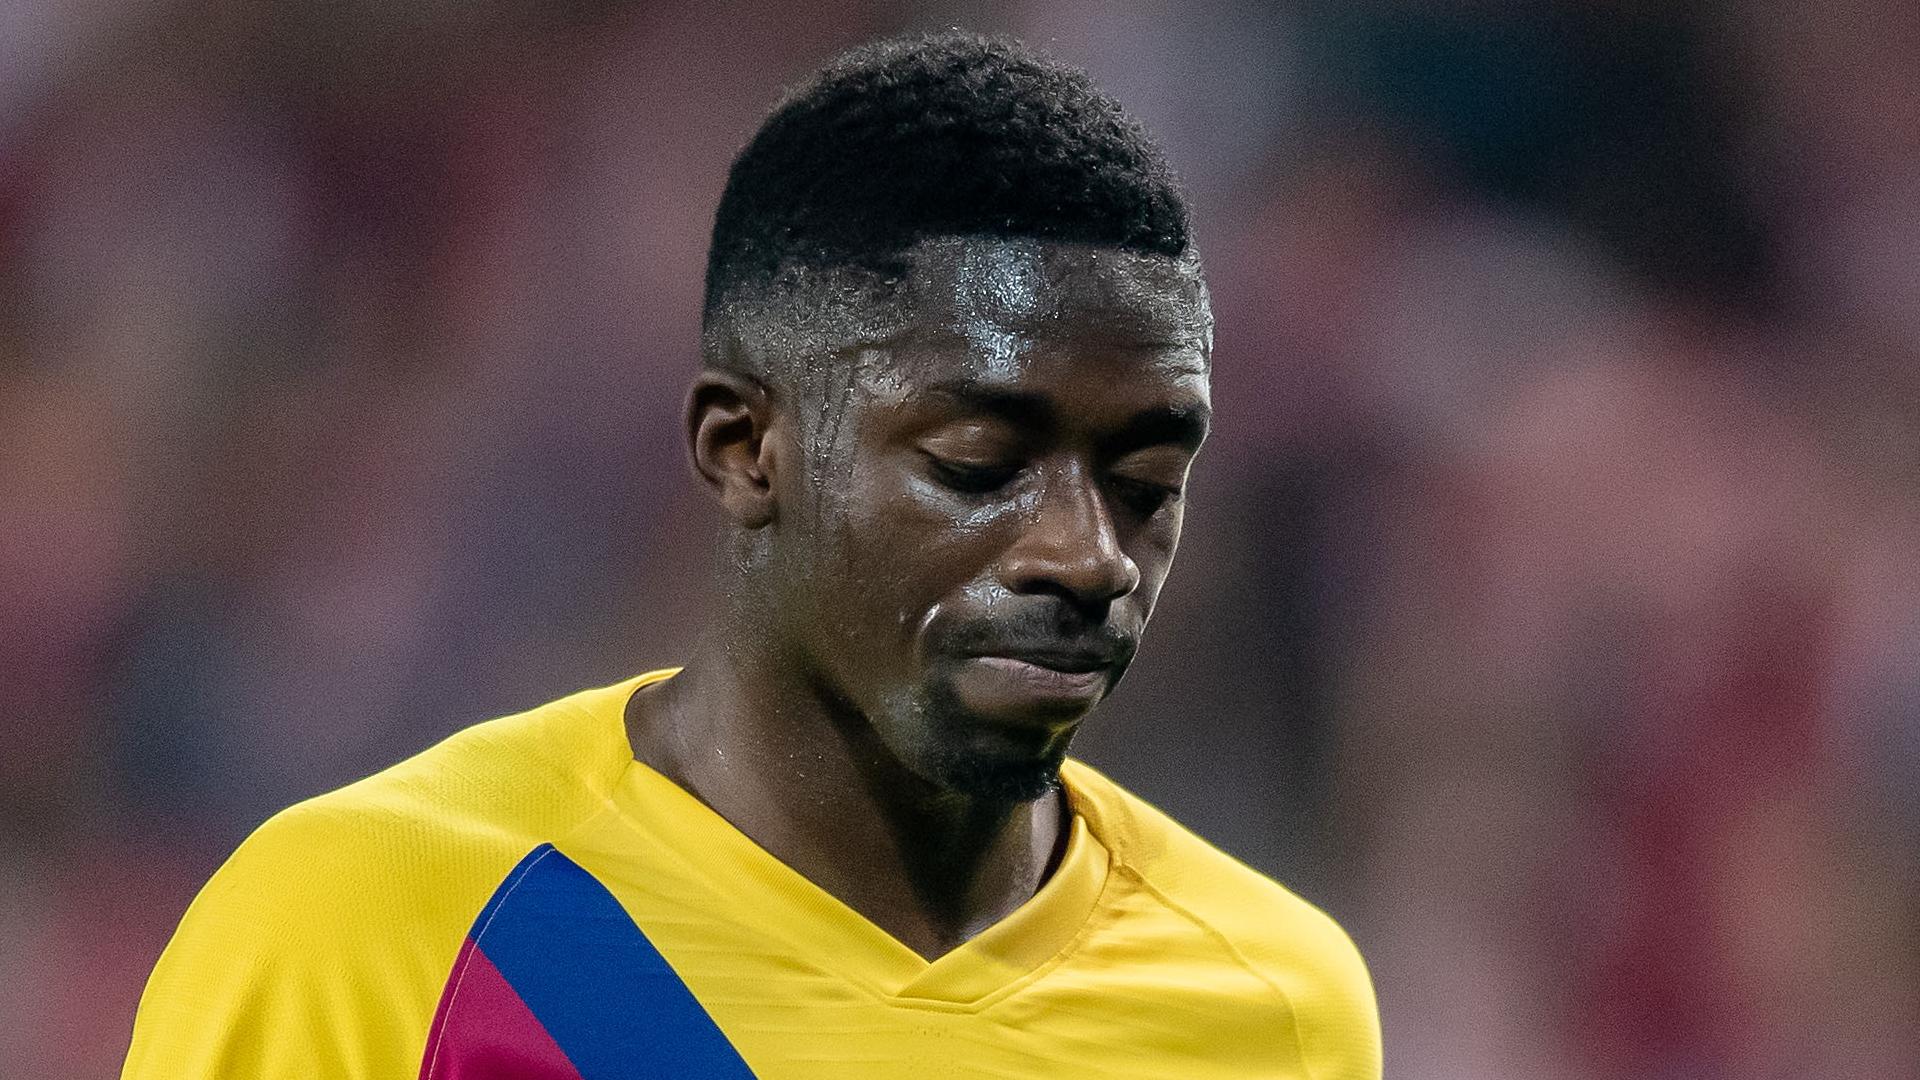 'We trust in his talent' – Bartomeu backs Dembele as Barca prepare for 'post-Messi' era